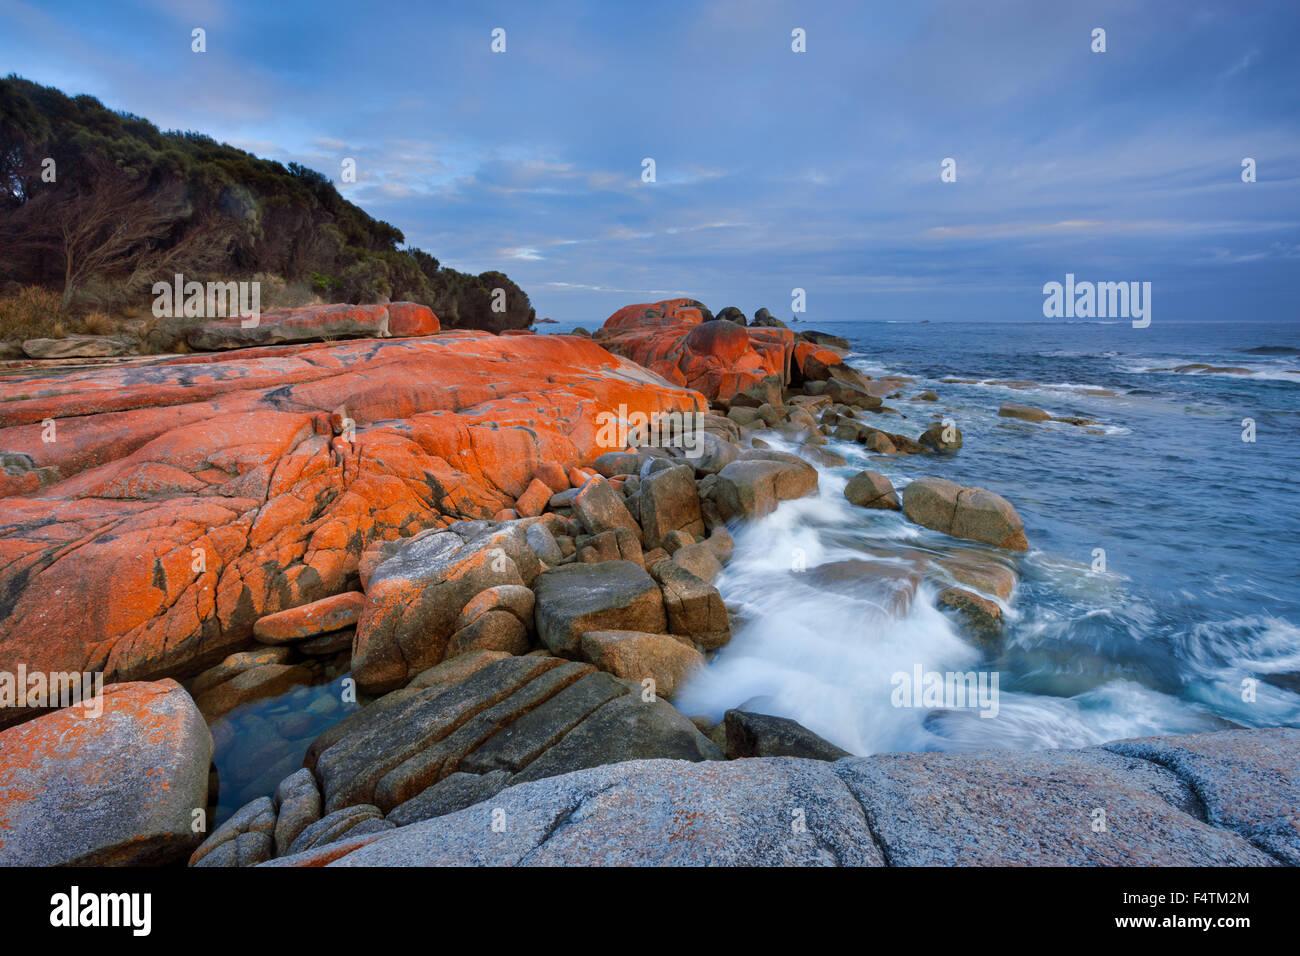 Bay of Fires, Australia, Tasmania, east coast, sea, rock, cliff, lichens - Stock Image